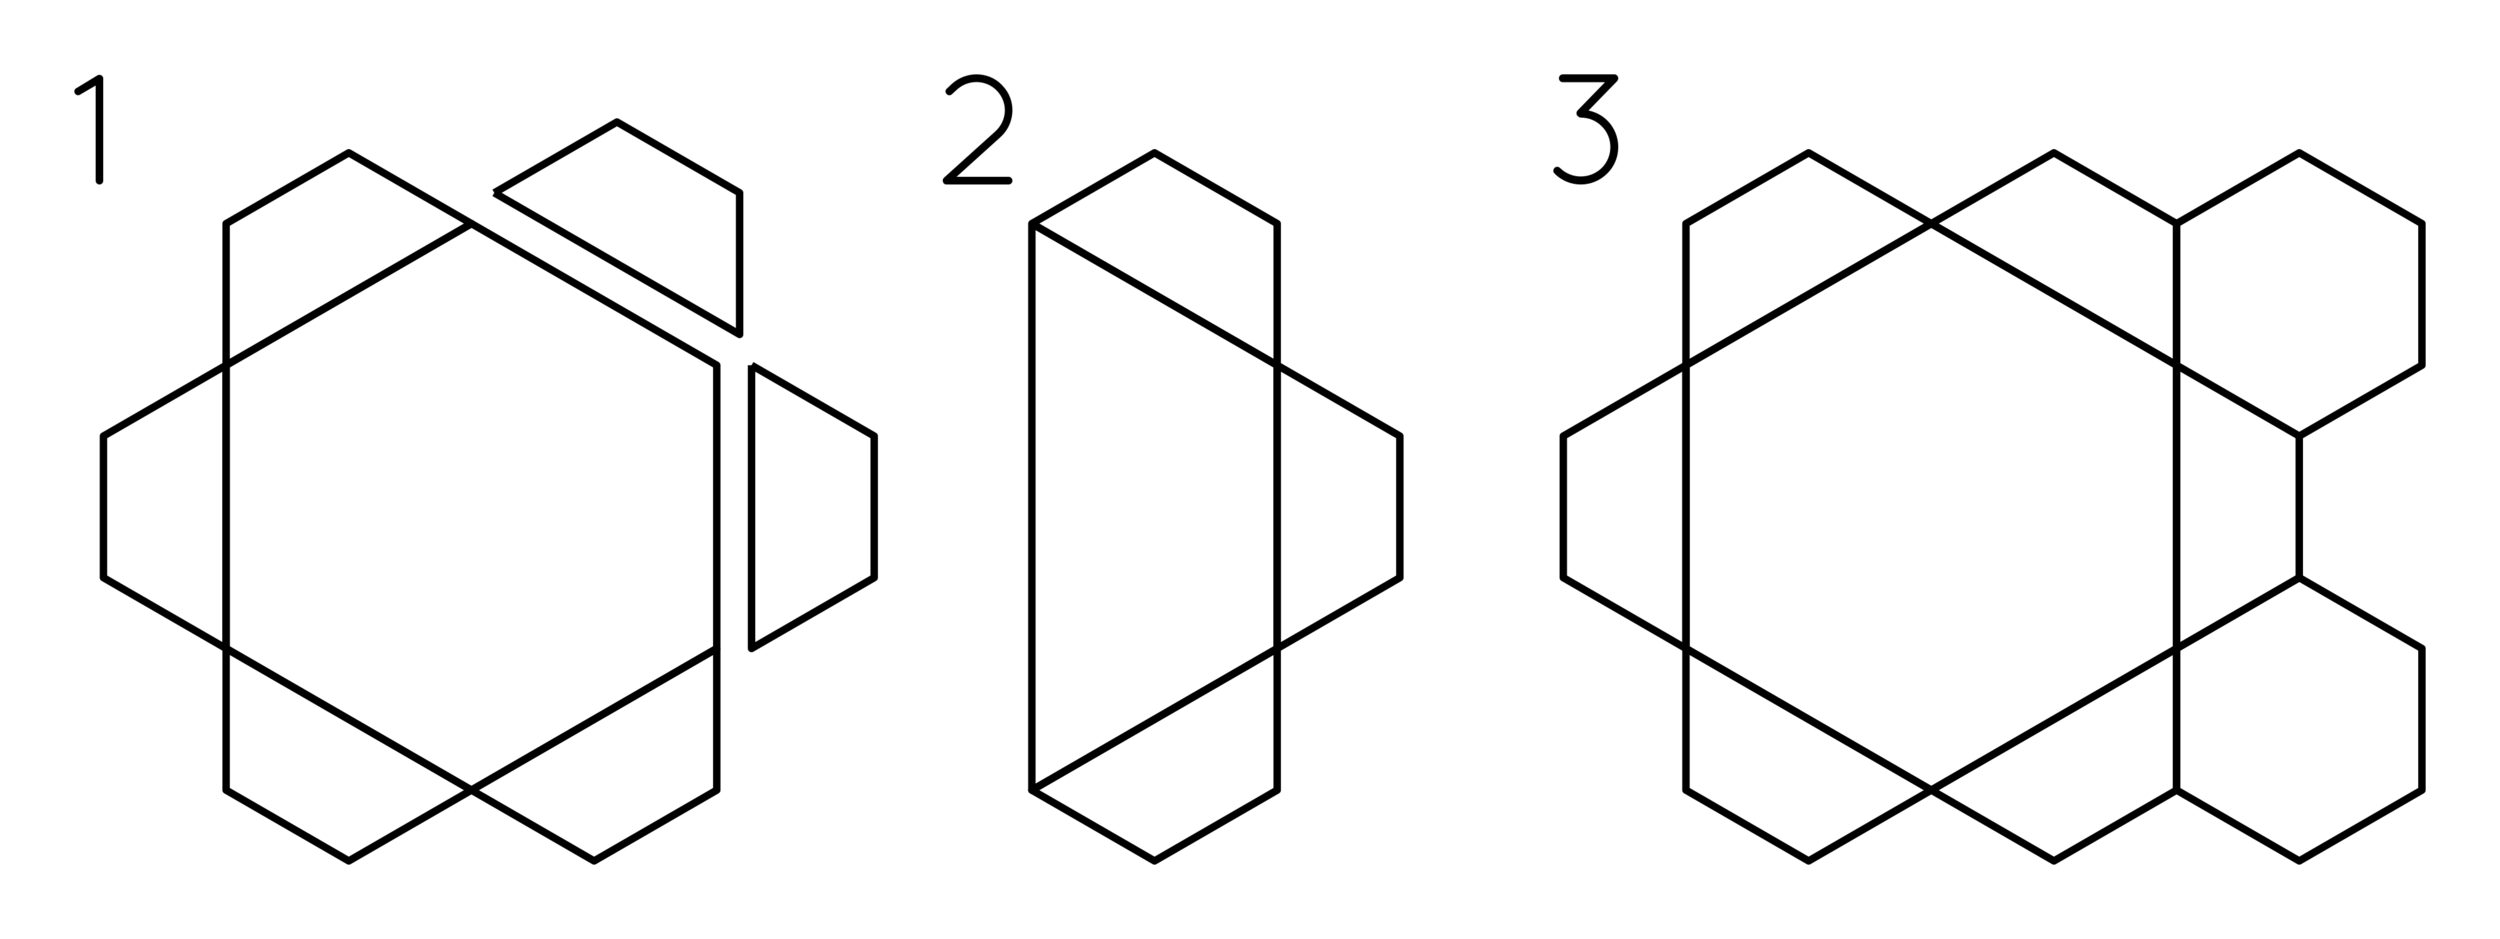 CombinedDiagrams1-3.png